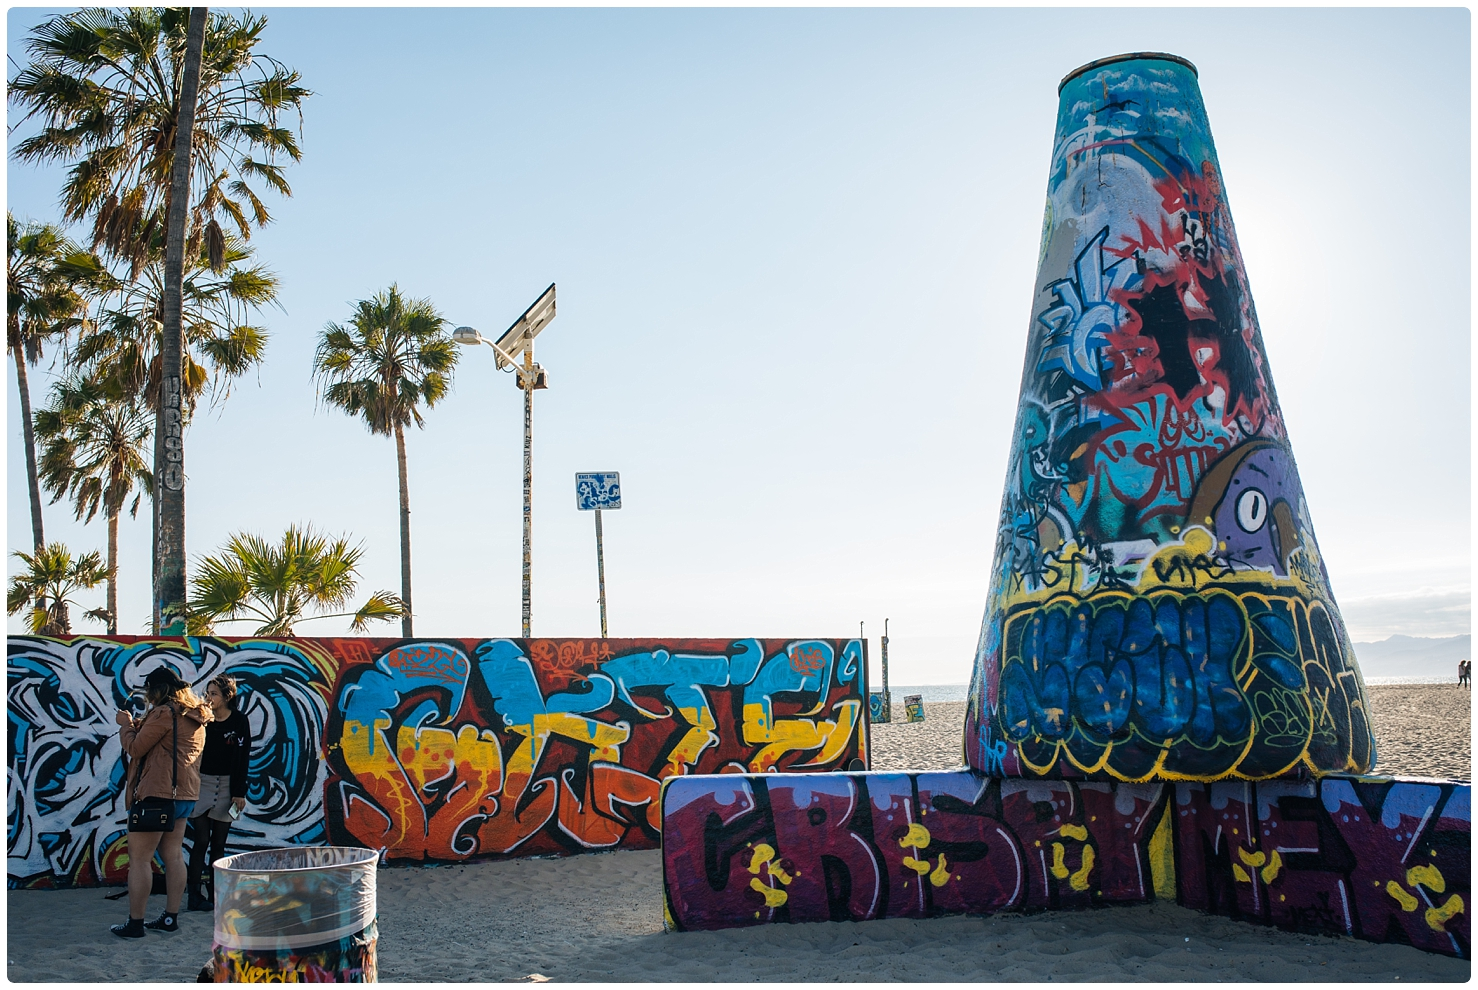 Beach,Boardwalk,California,Venice,Venice Beach,graffiti,haylo photo,haylo photography,northern virginia photographer,